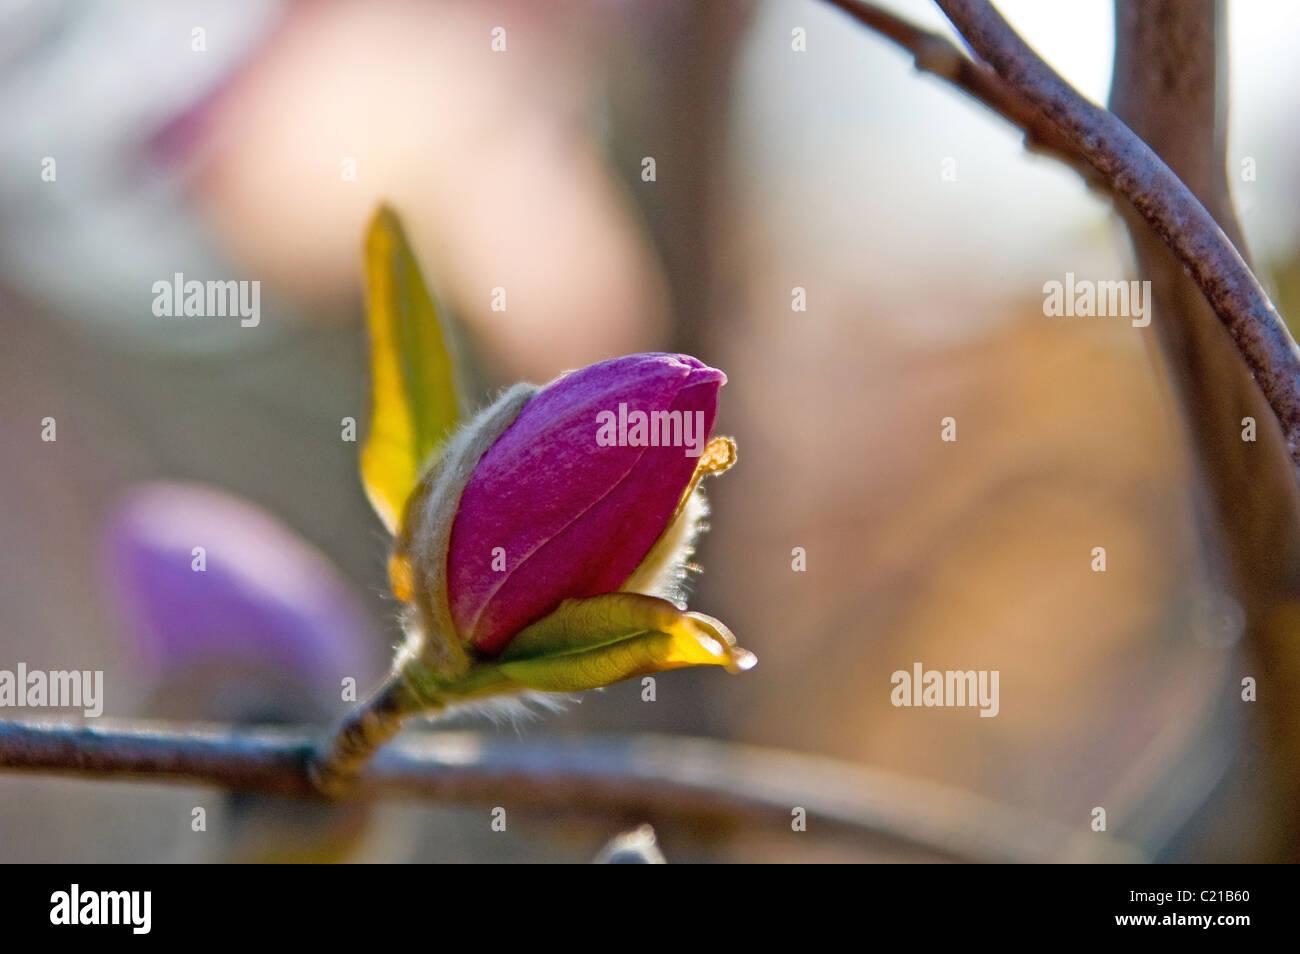 Magnolia blossom, at Raulston Arboretum, North Carolina State University, Raleigh, NC, USA Stock Photo